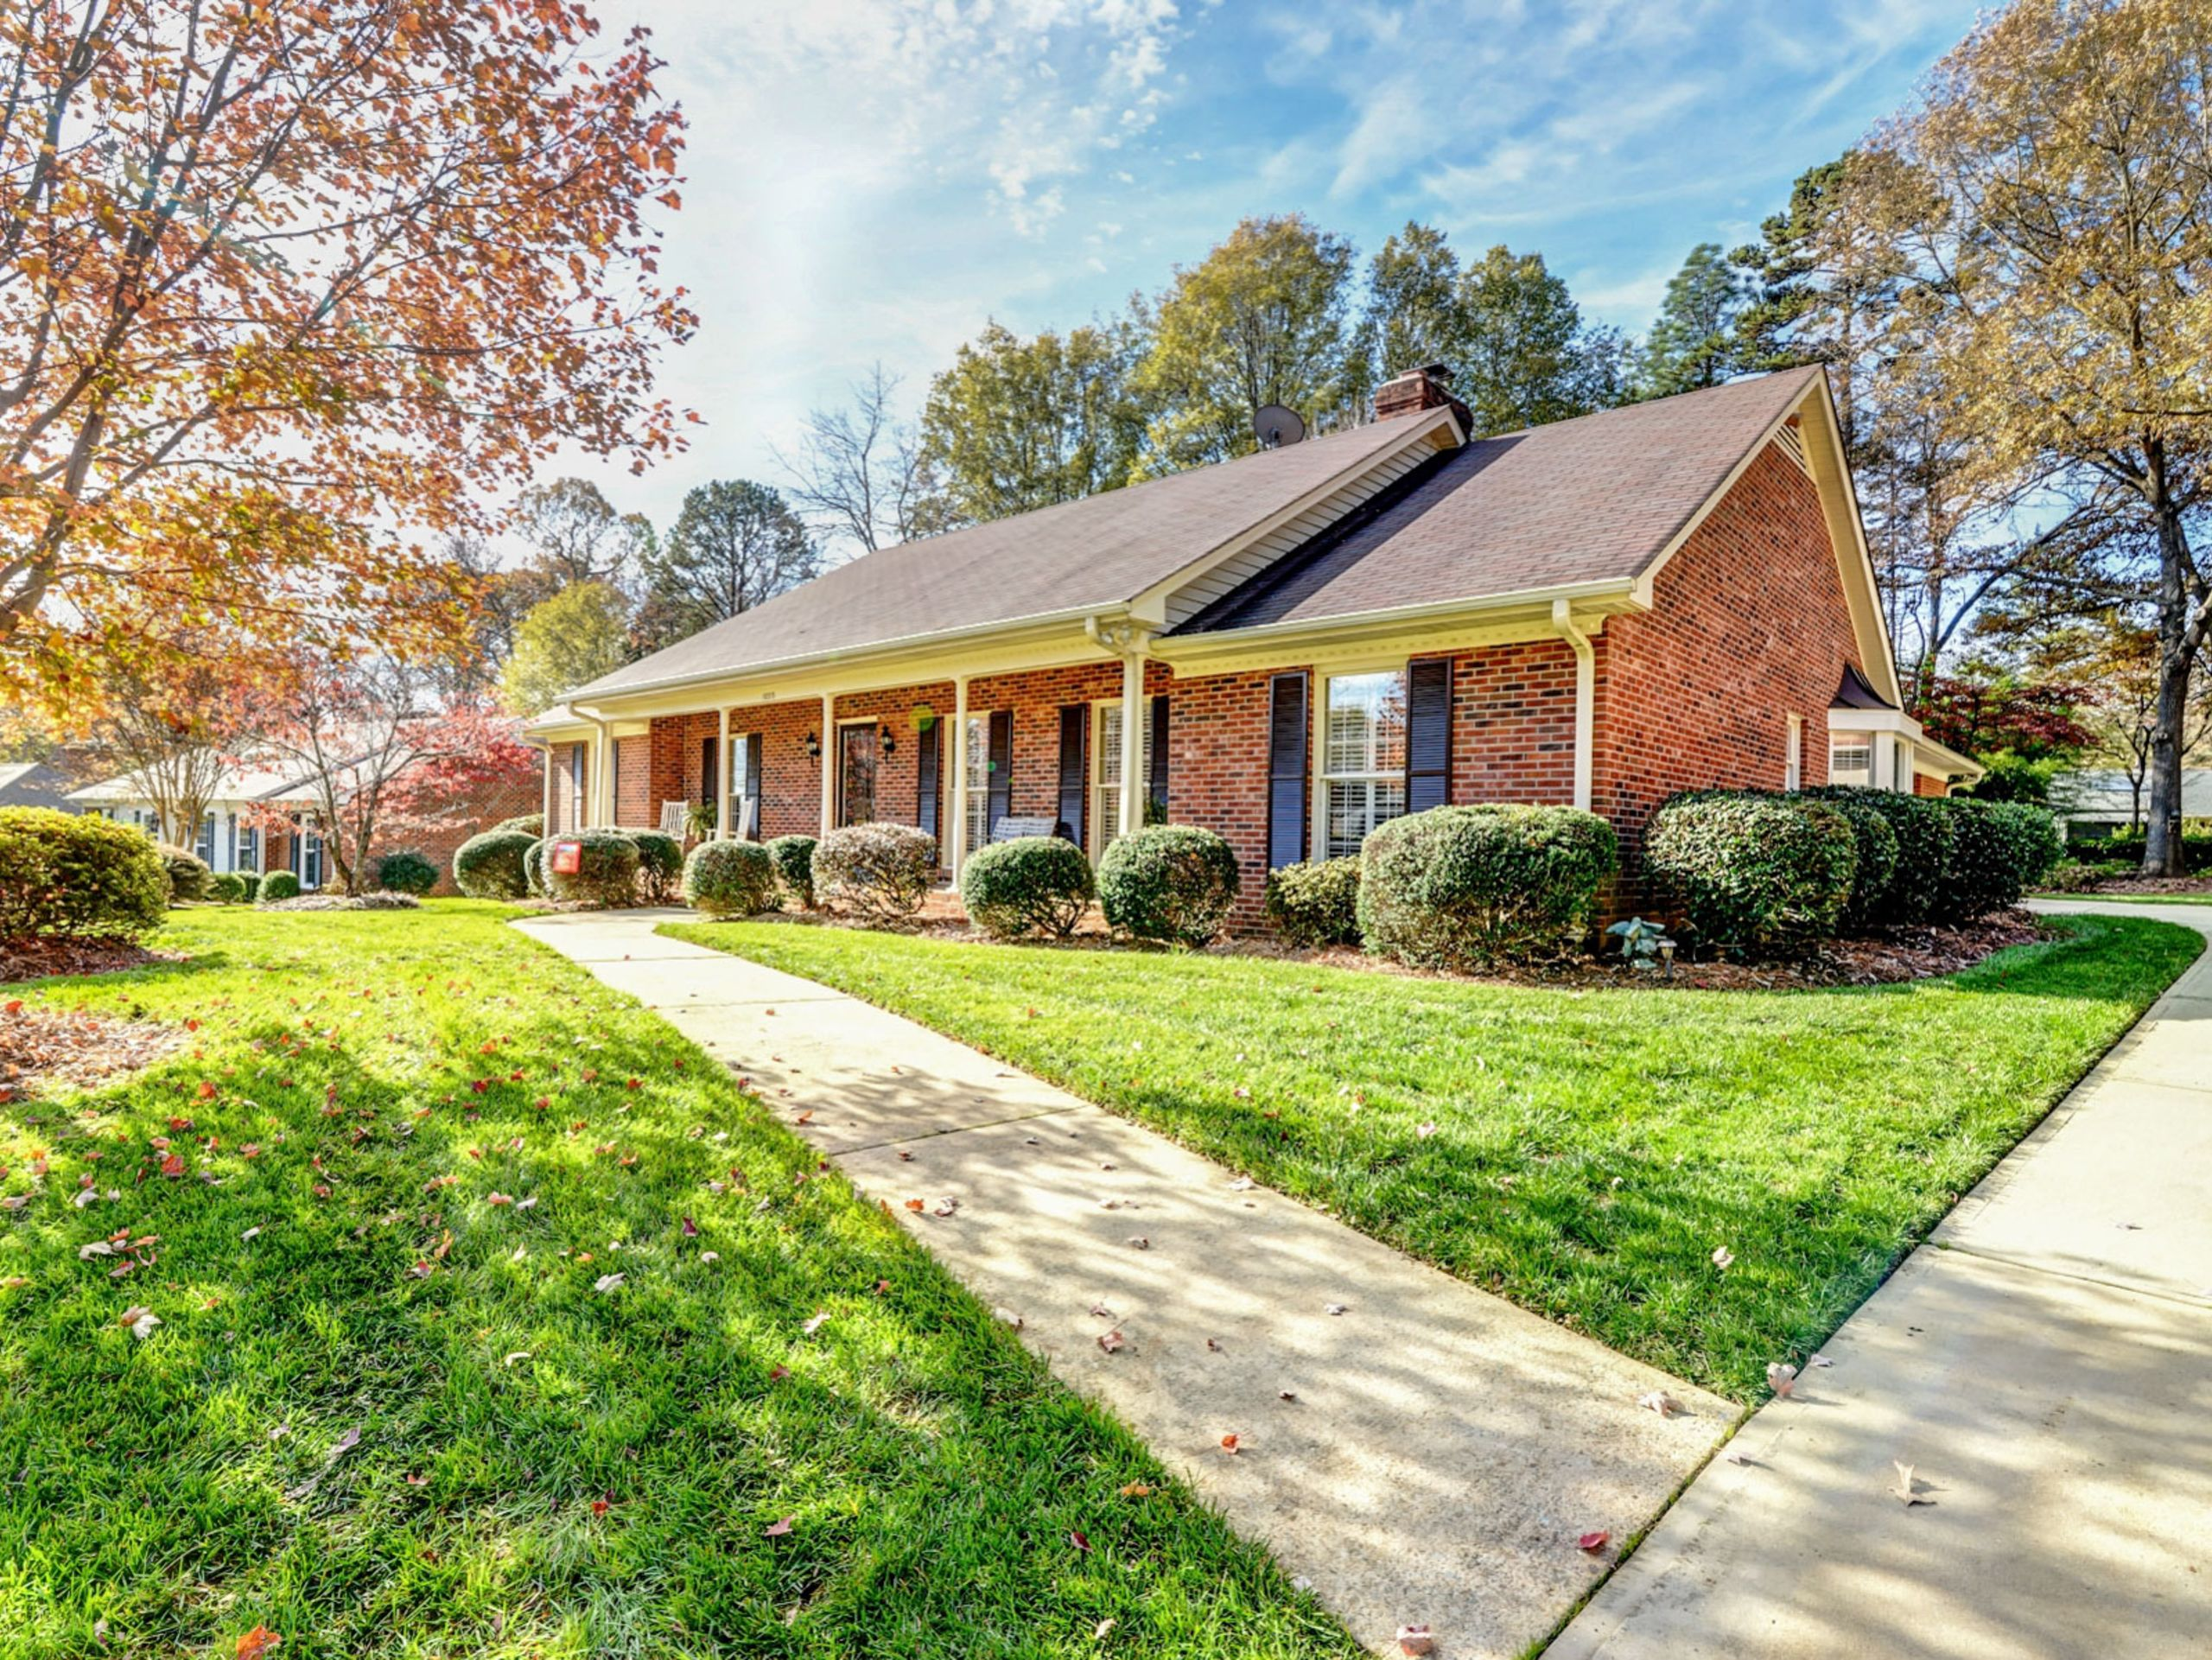 Charming brick home in established neighborhood